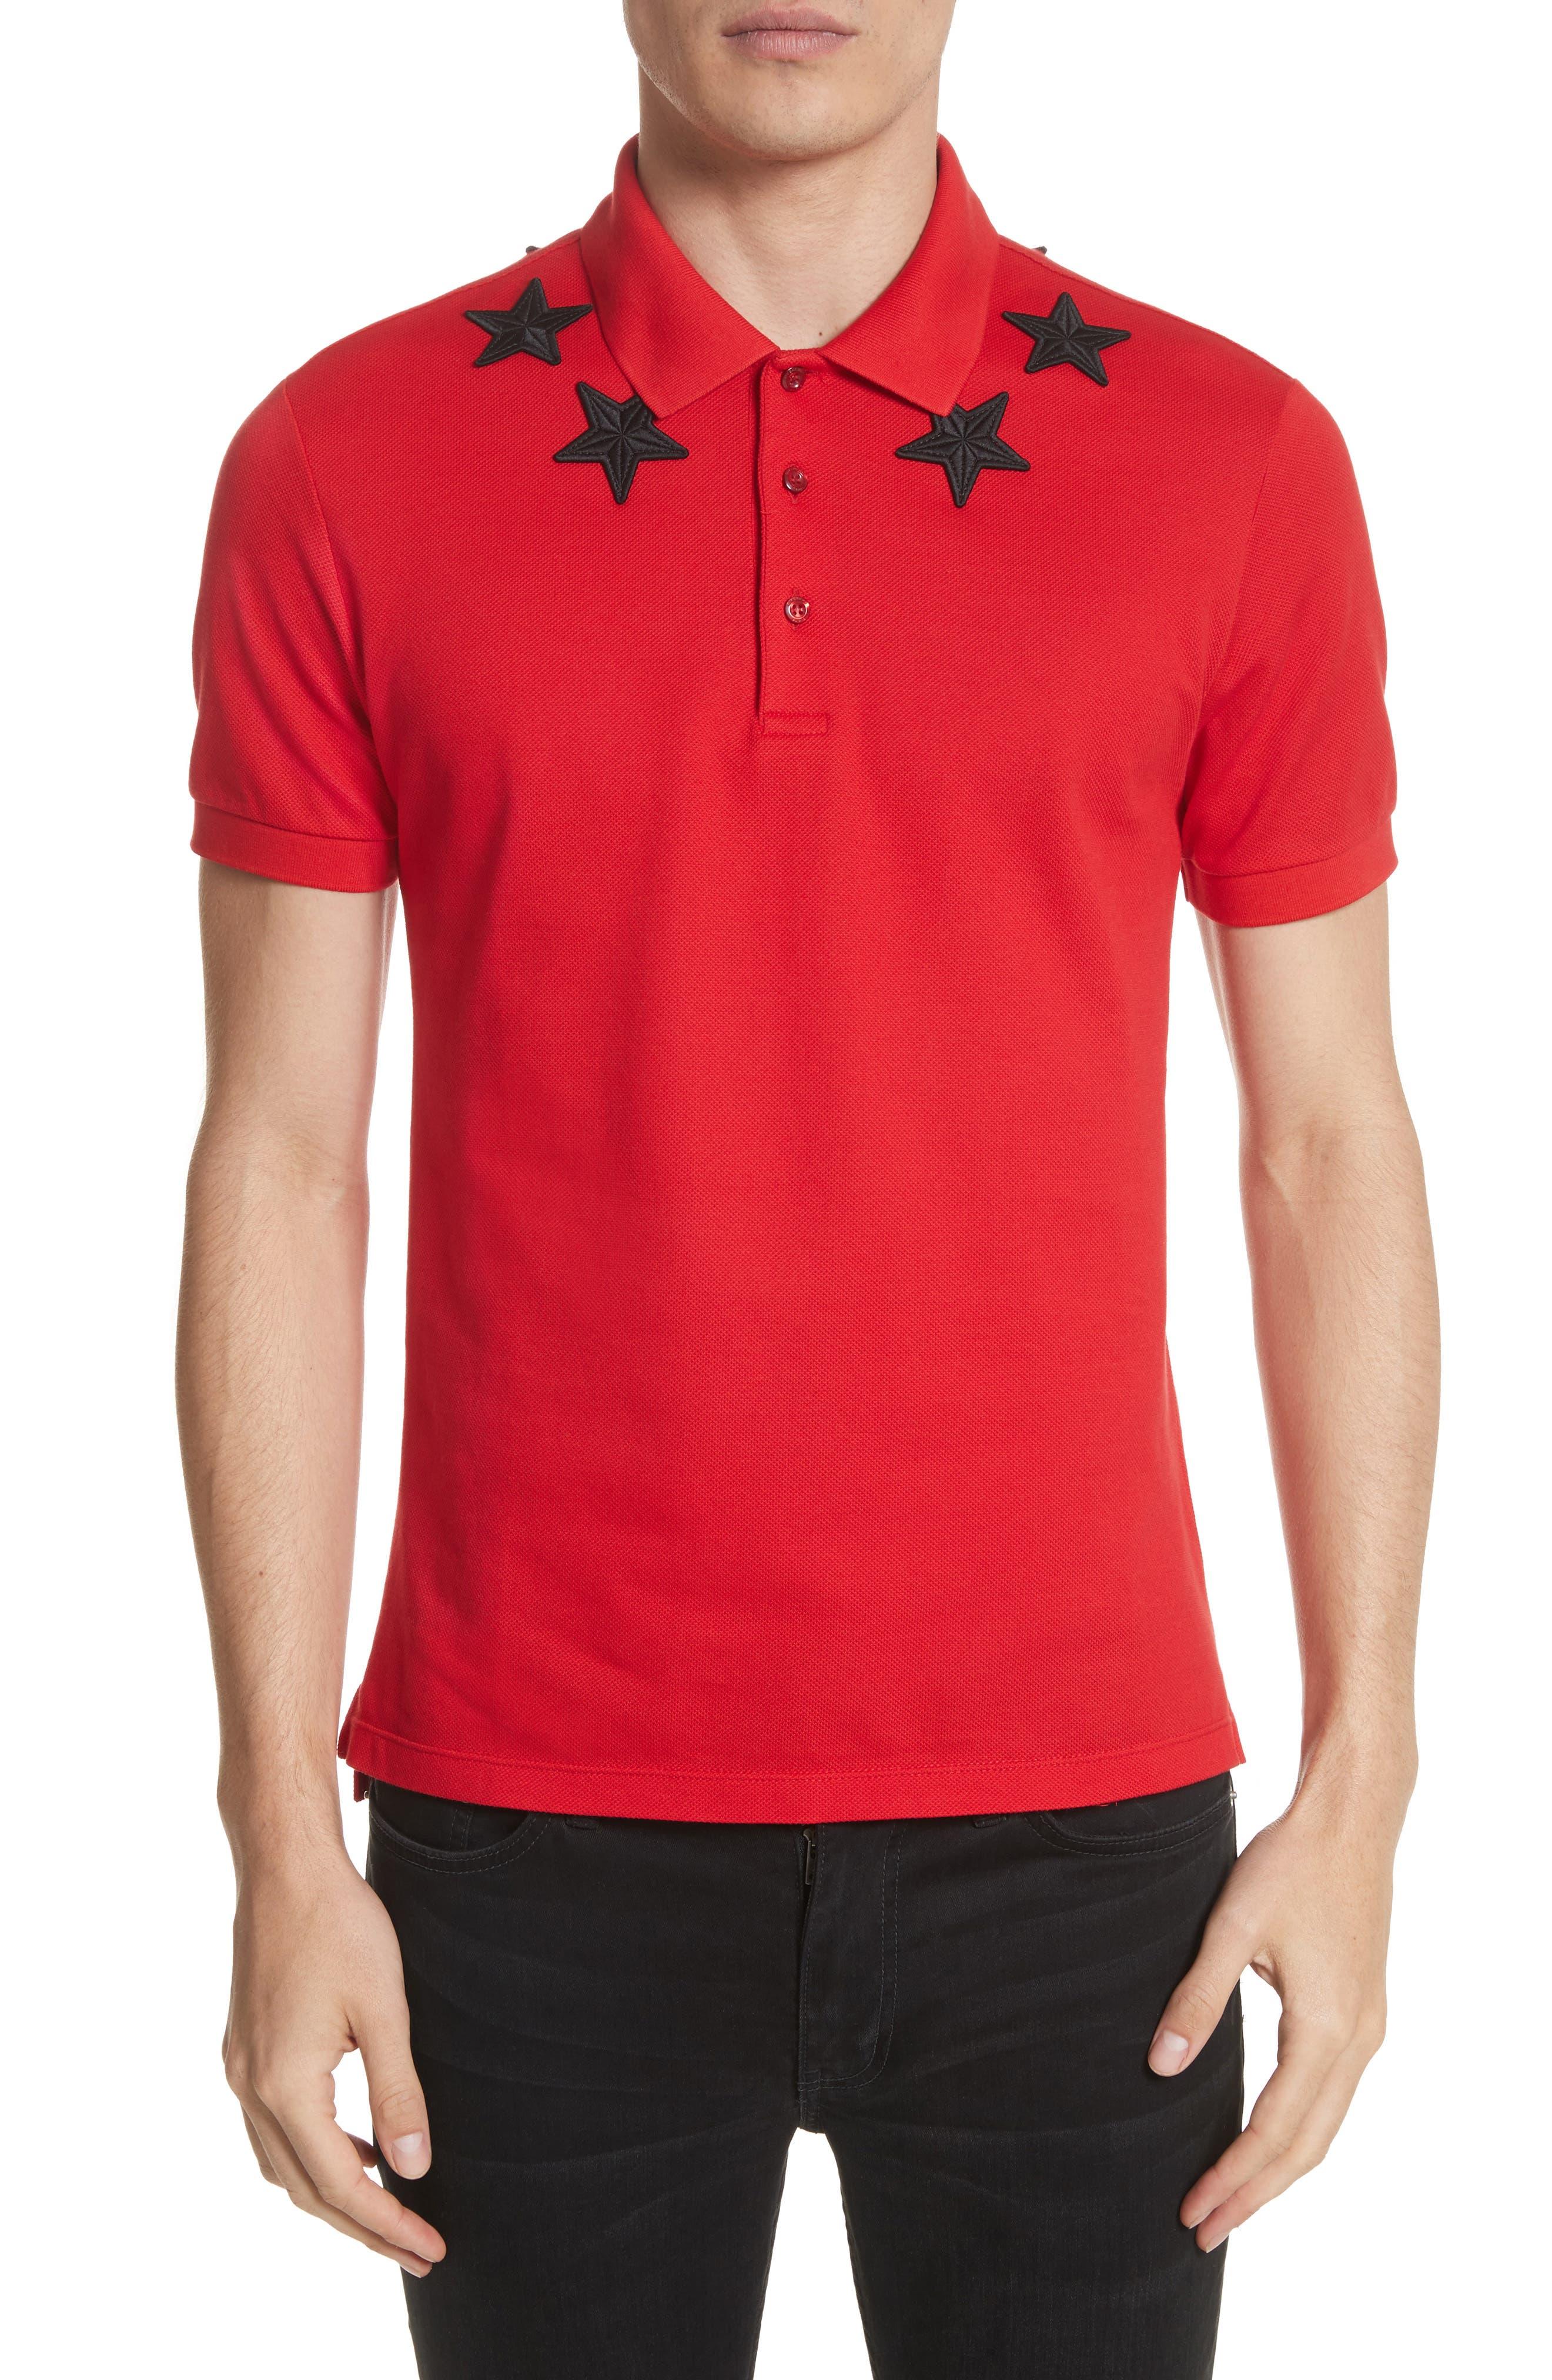 Givenchy Star Polo Shirt